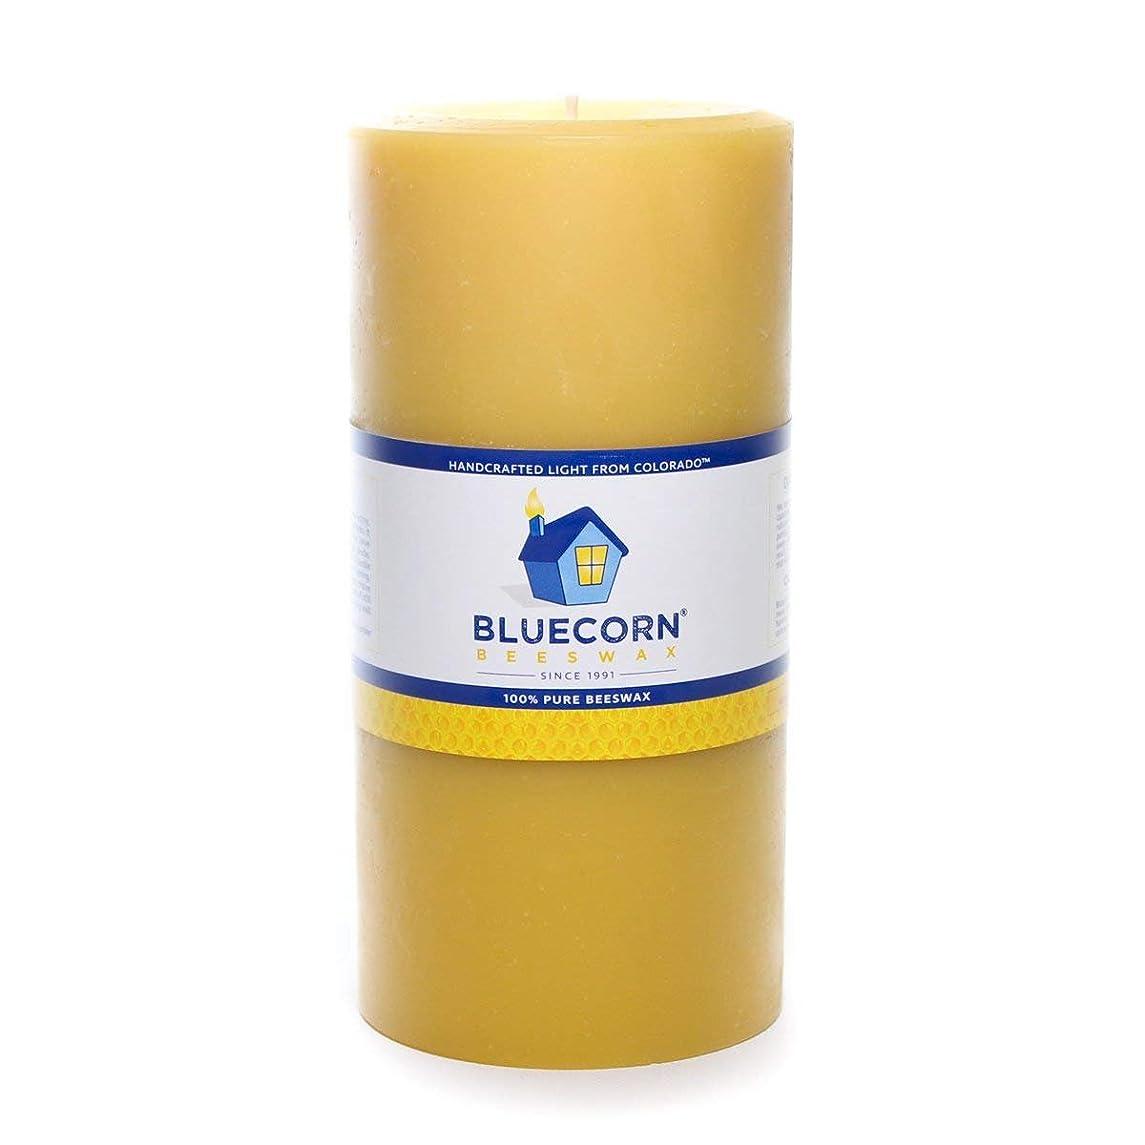 Bluecorn Beeswax 100% Pure Raw Beeswax Pillar: 4